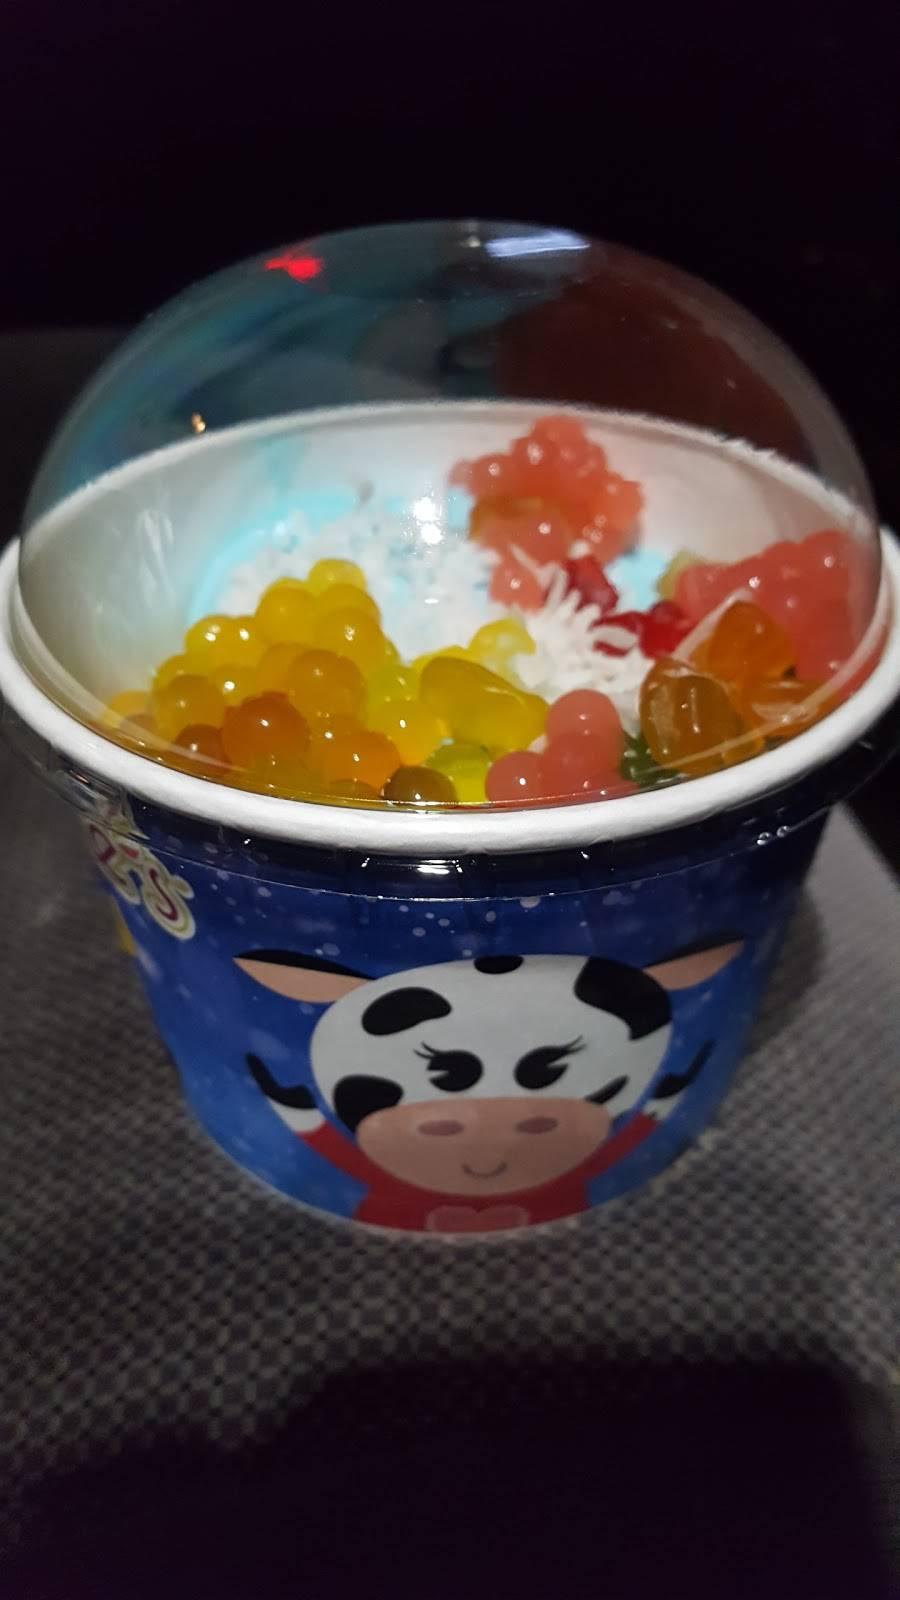 Menchies Frozen Yogurt | bakery | 1265 N Hacienda Blvd, La Puente, CA 91744, USA | 6269181924 OR +1 626-918-1924